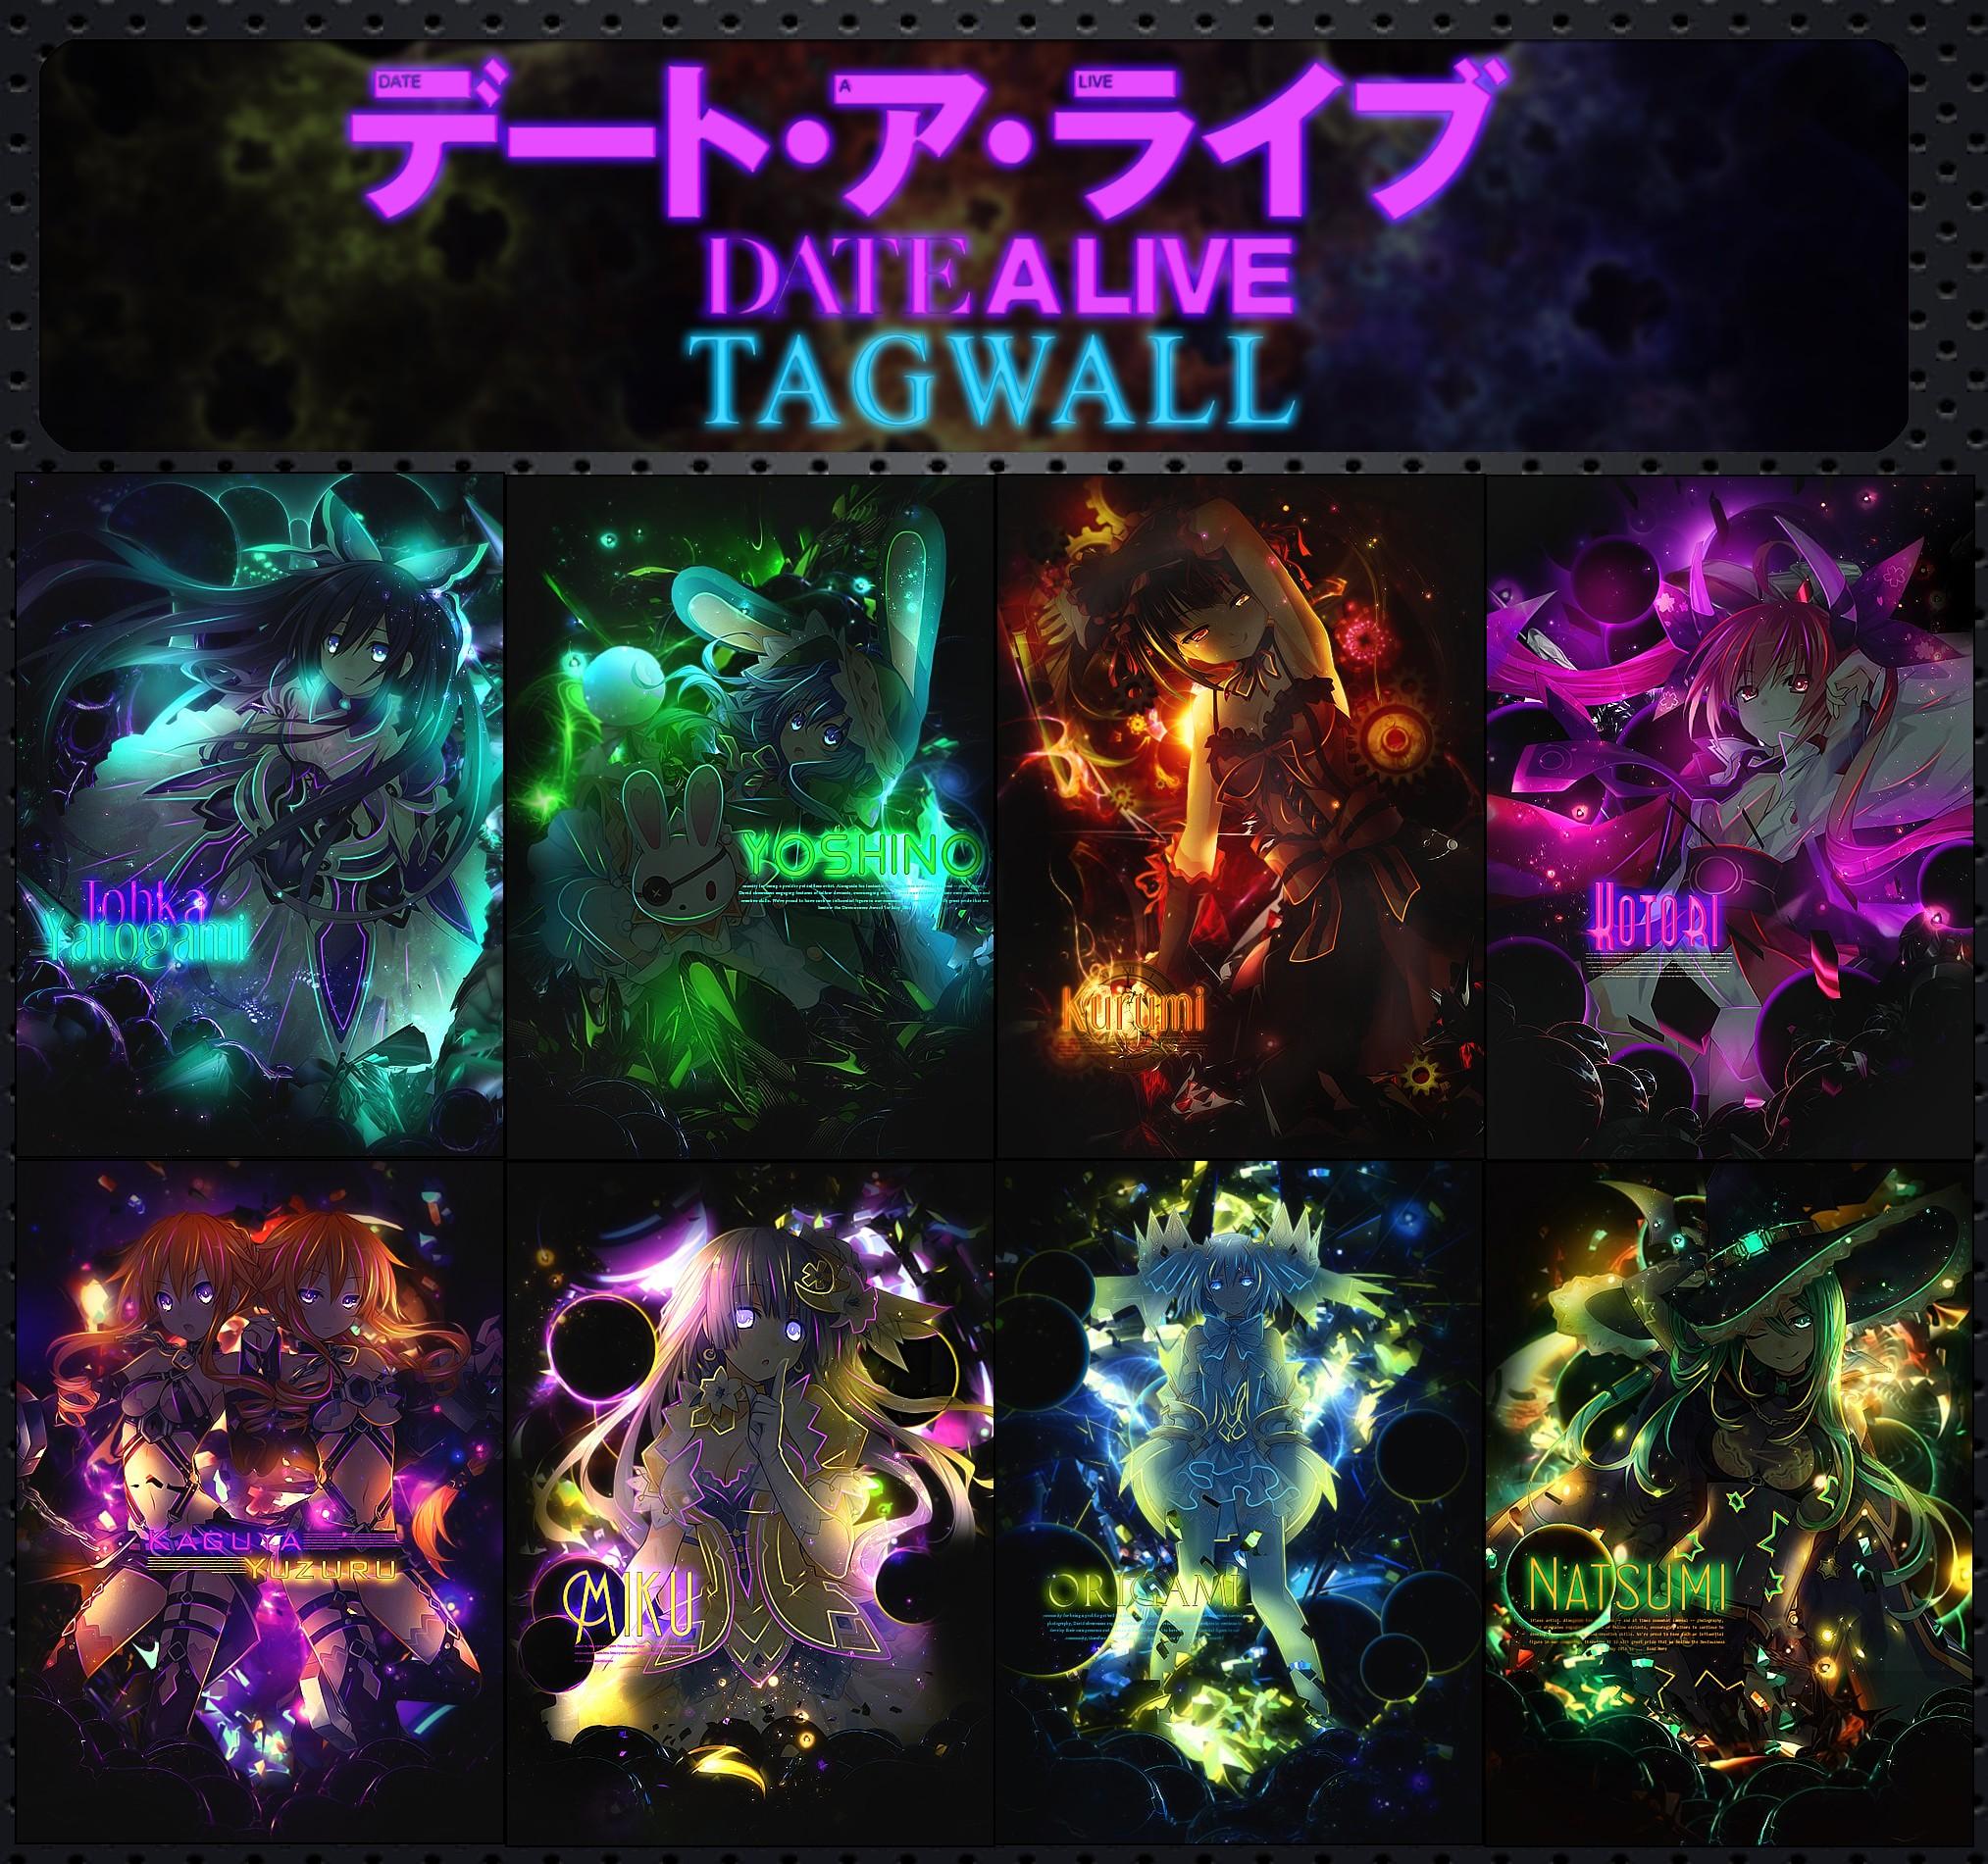 Beautiful Girl Live Wallpaper Hd Date A Live Wallpaper 183 ① Download Free Beautiful Full Hd